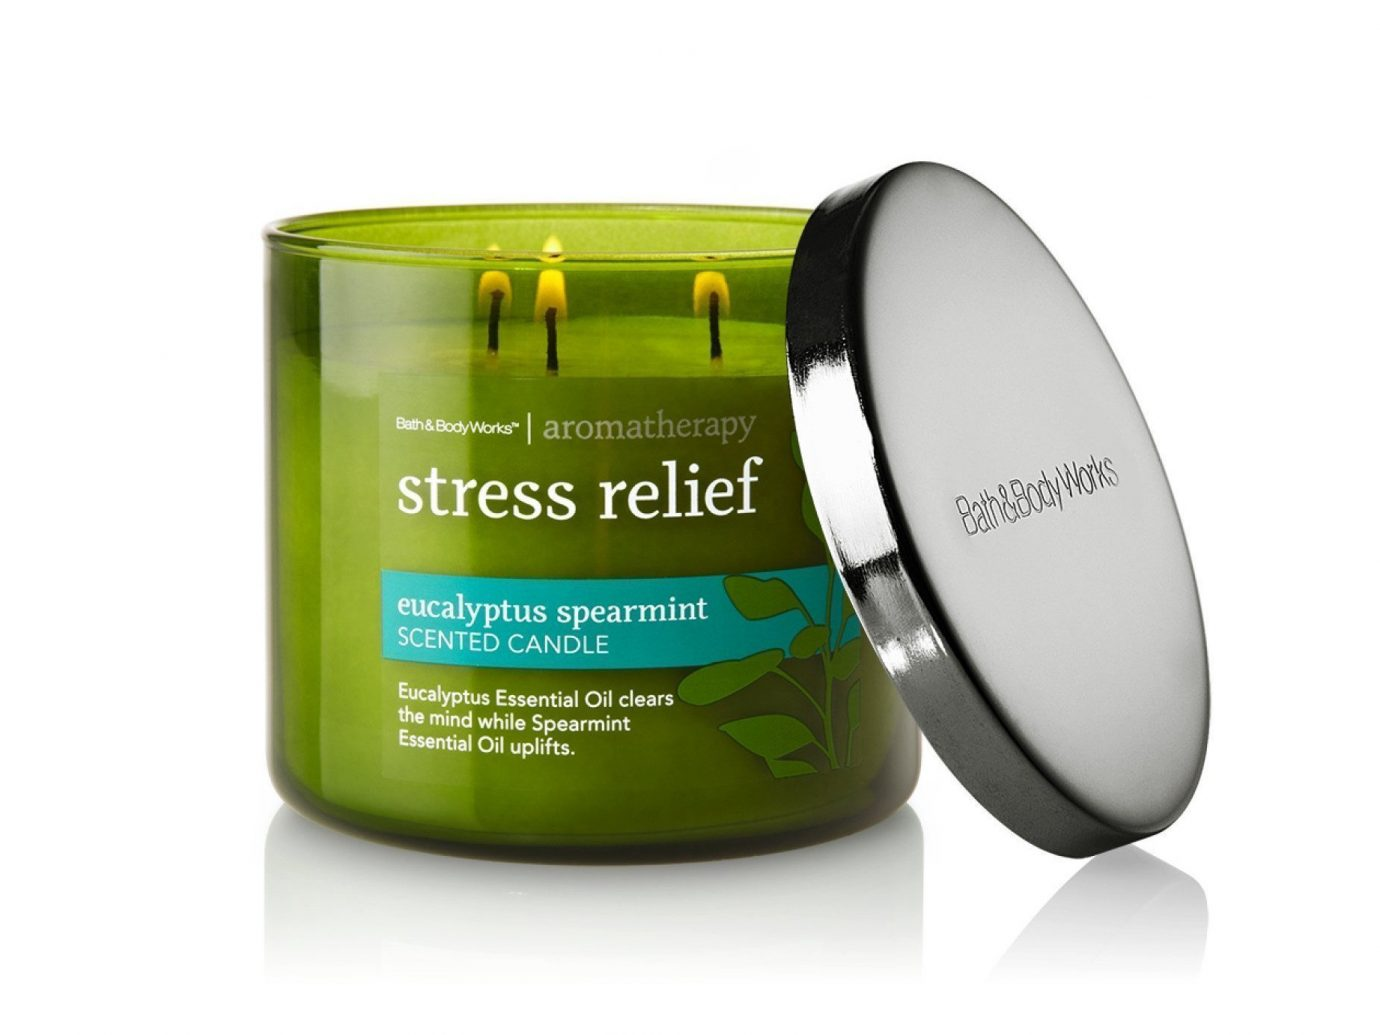 Health + Wellness Travel Tips product skin energy hand cream material